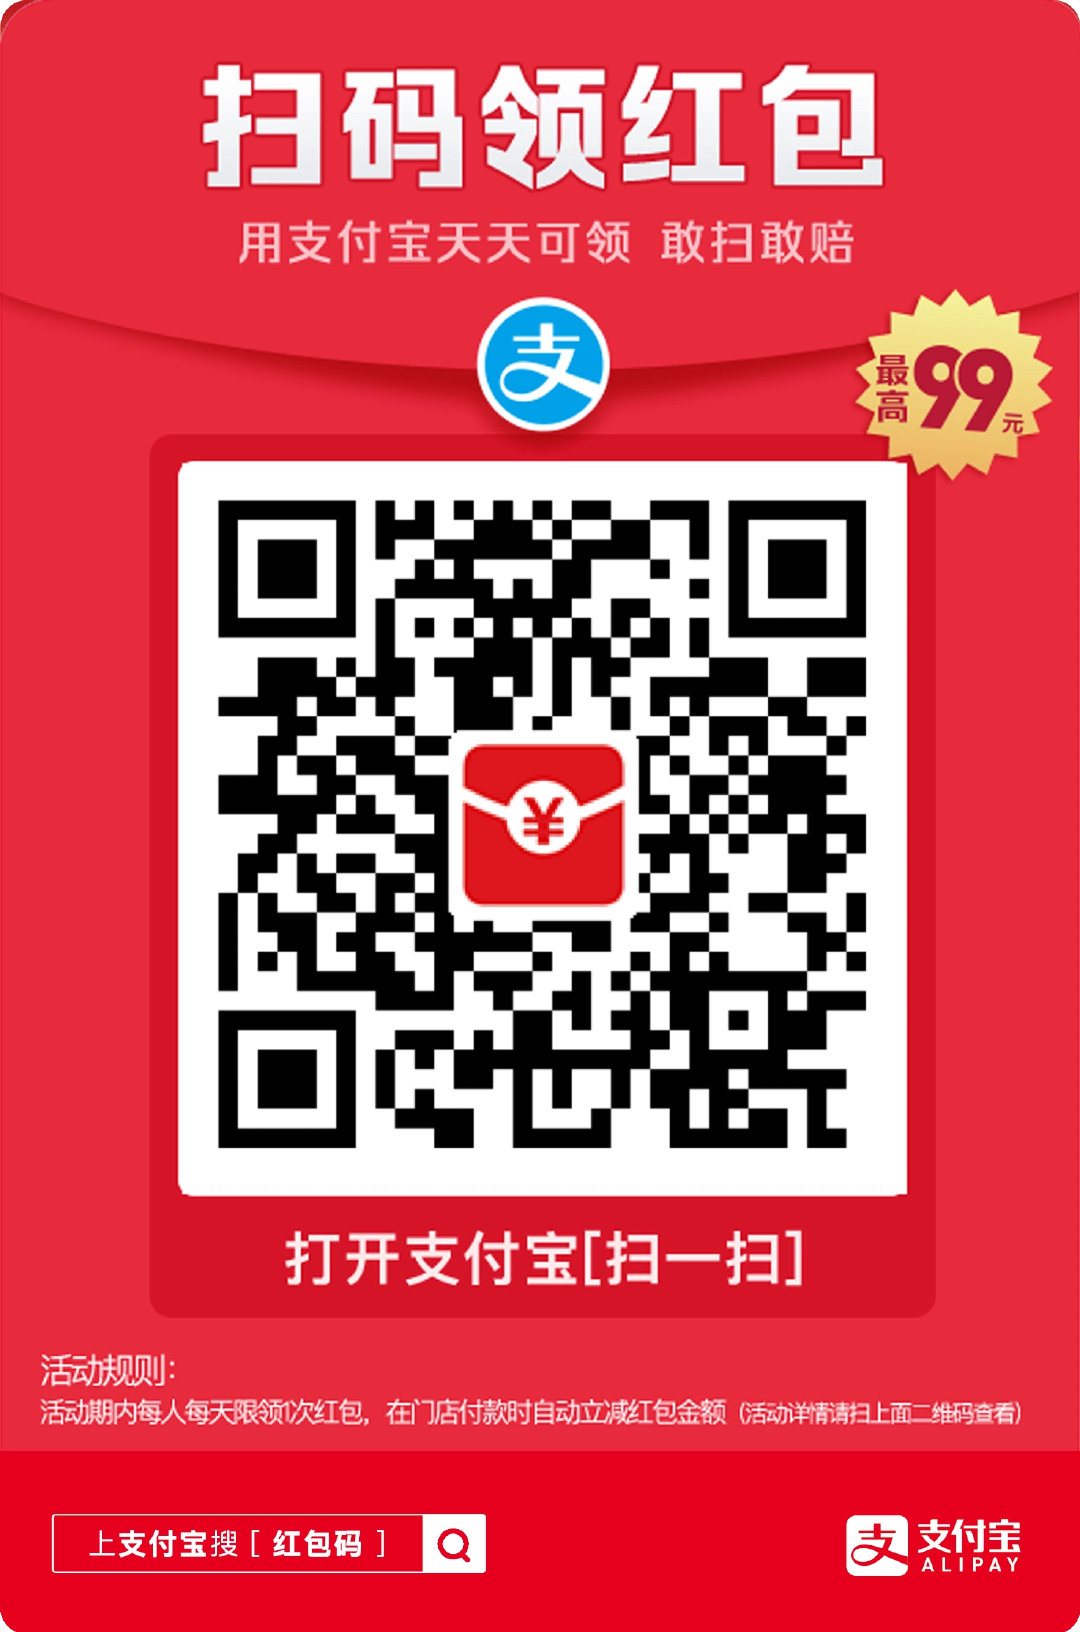 Ź�刘海短发发型图片2016女 ɒ�爱阁 Http Www Qqai Net